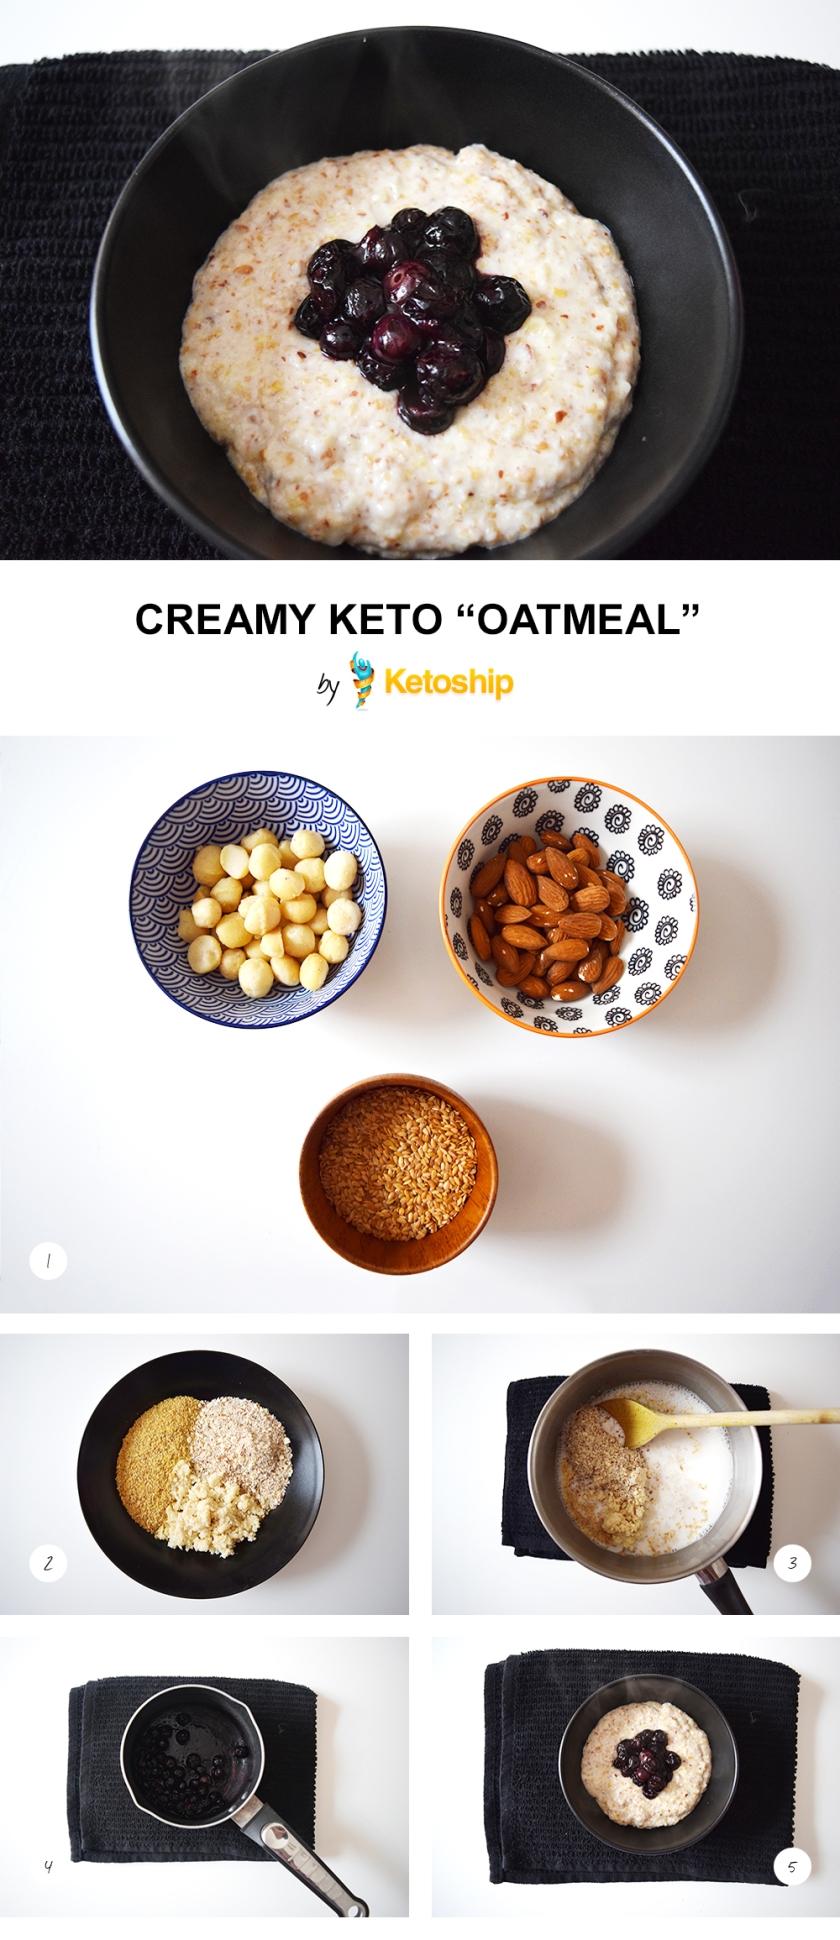 Creamy Keto Oatmeal recipe | Ketoship